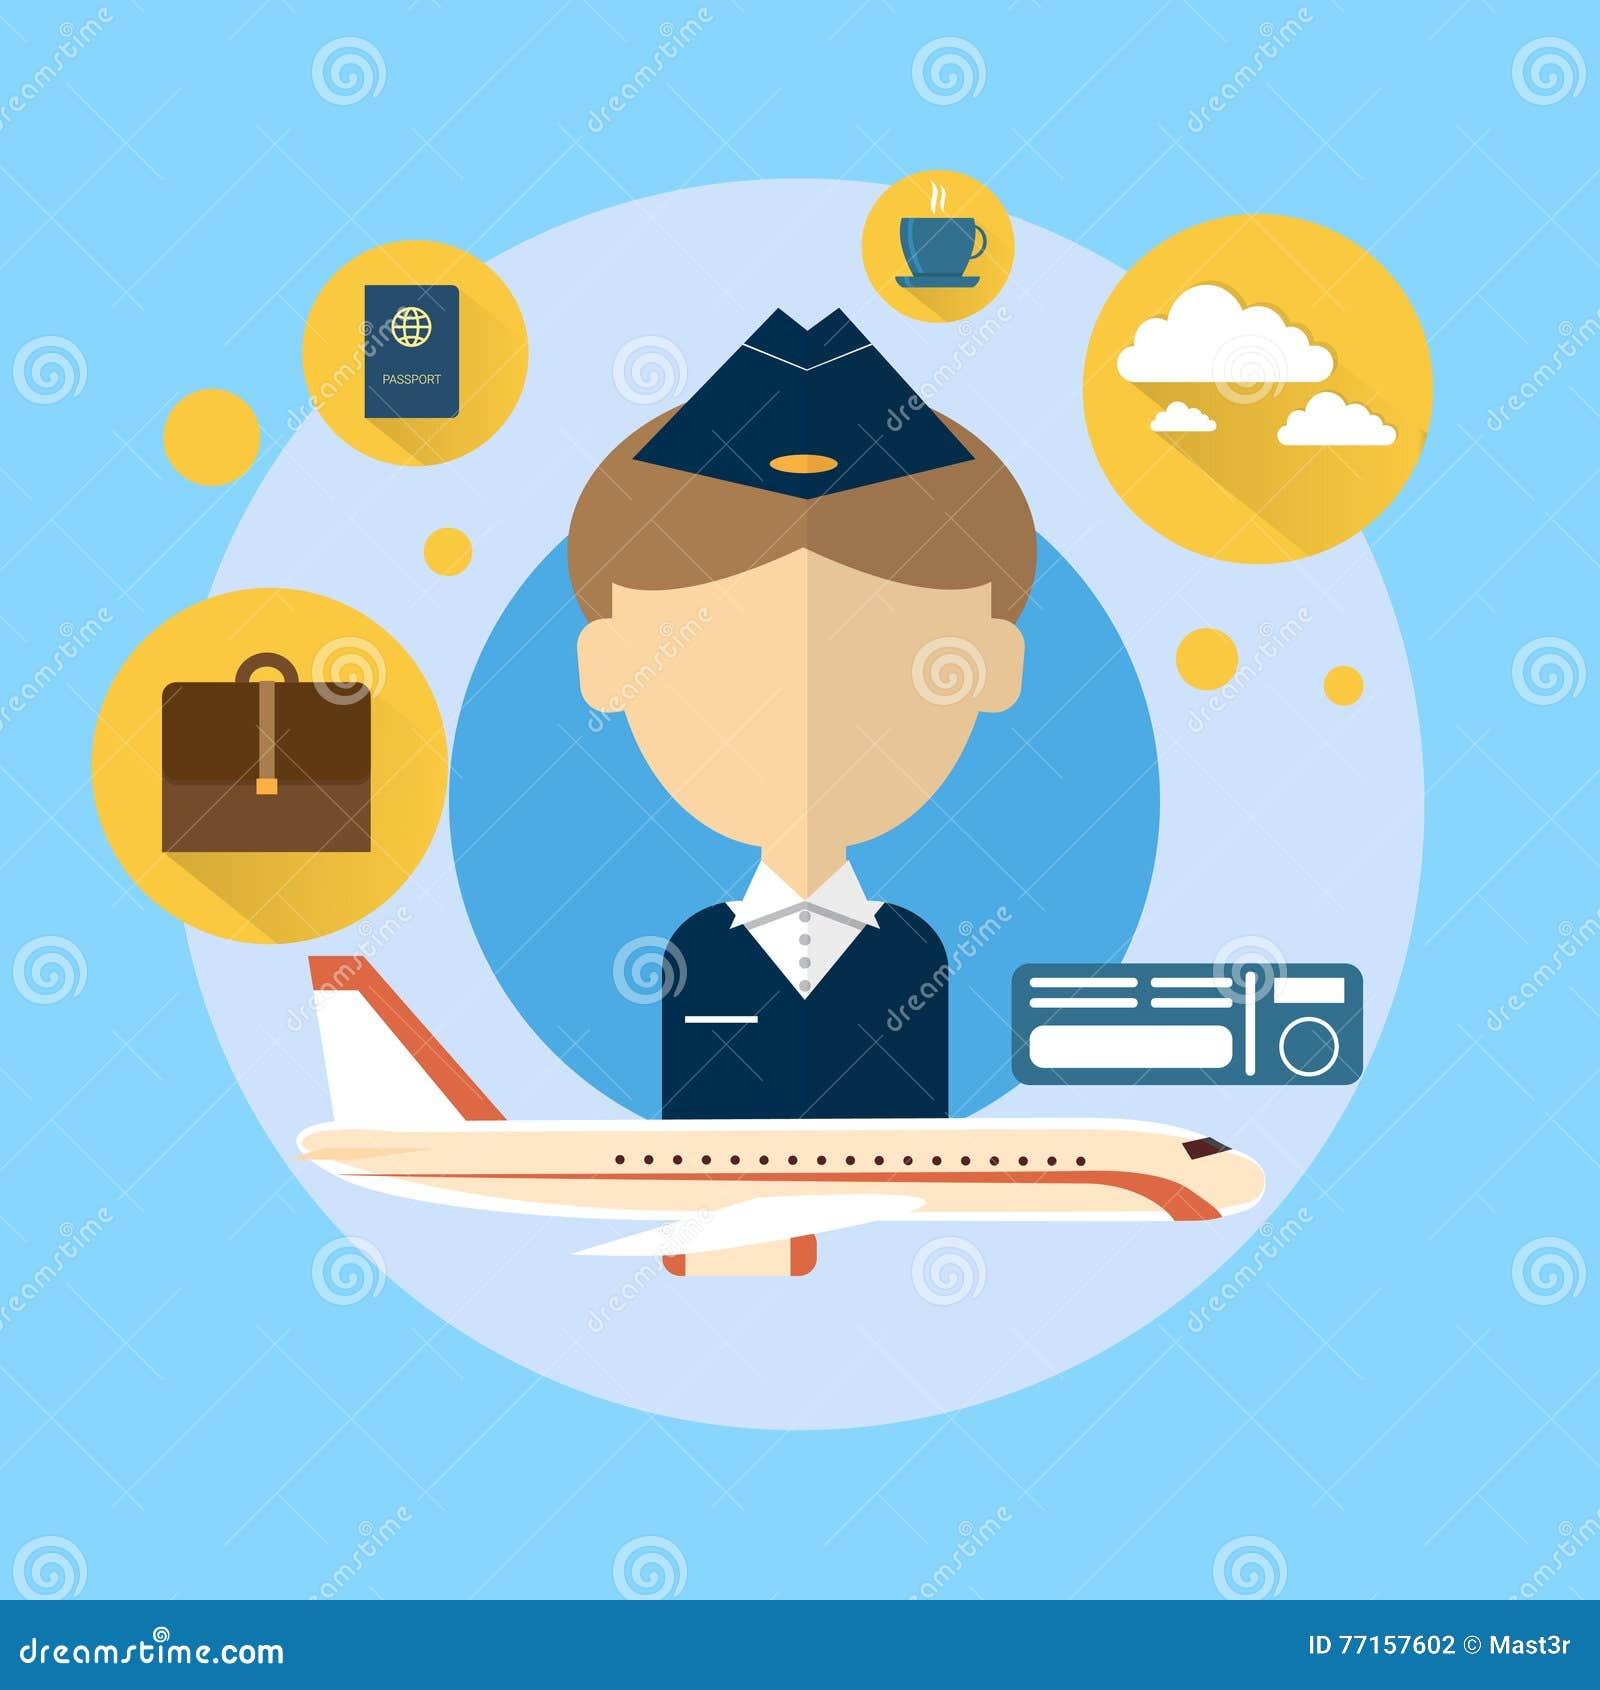 Steward Airport Crew Icon